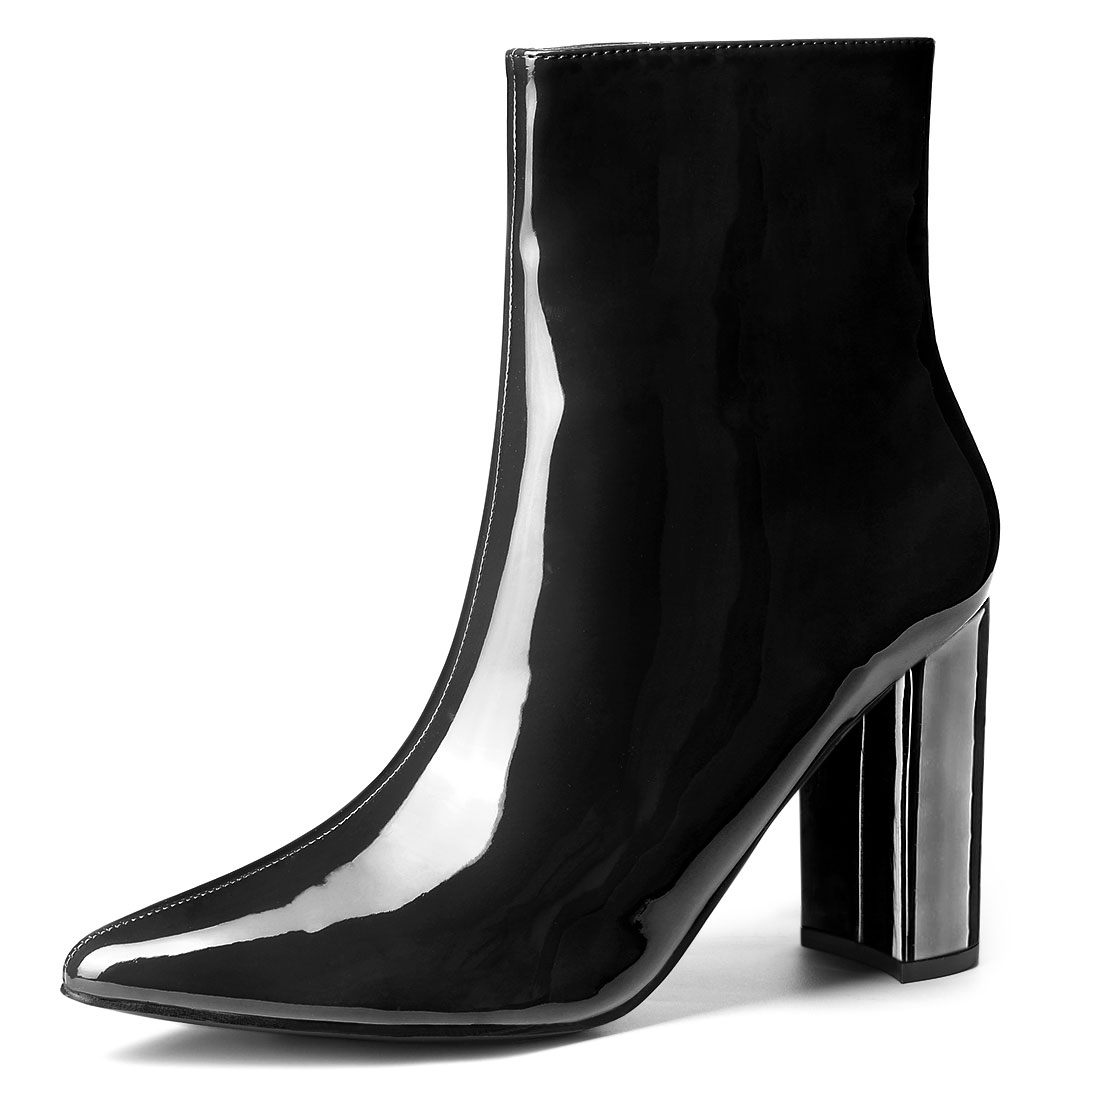 Allegra K Women's Chunky Heel Pointed Toe Zip Ankle Boots Black US 7